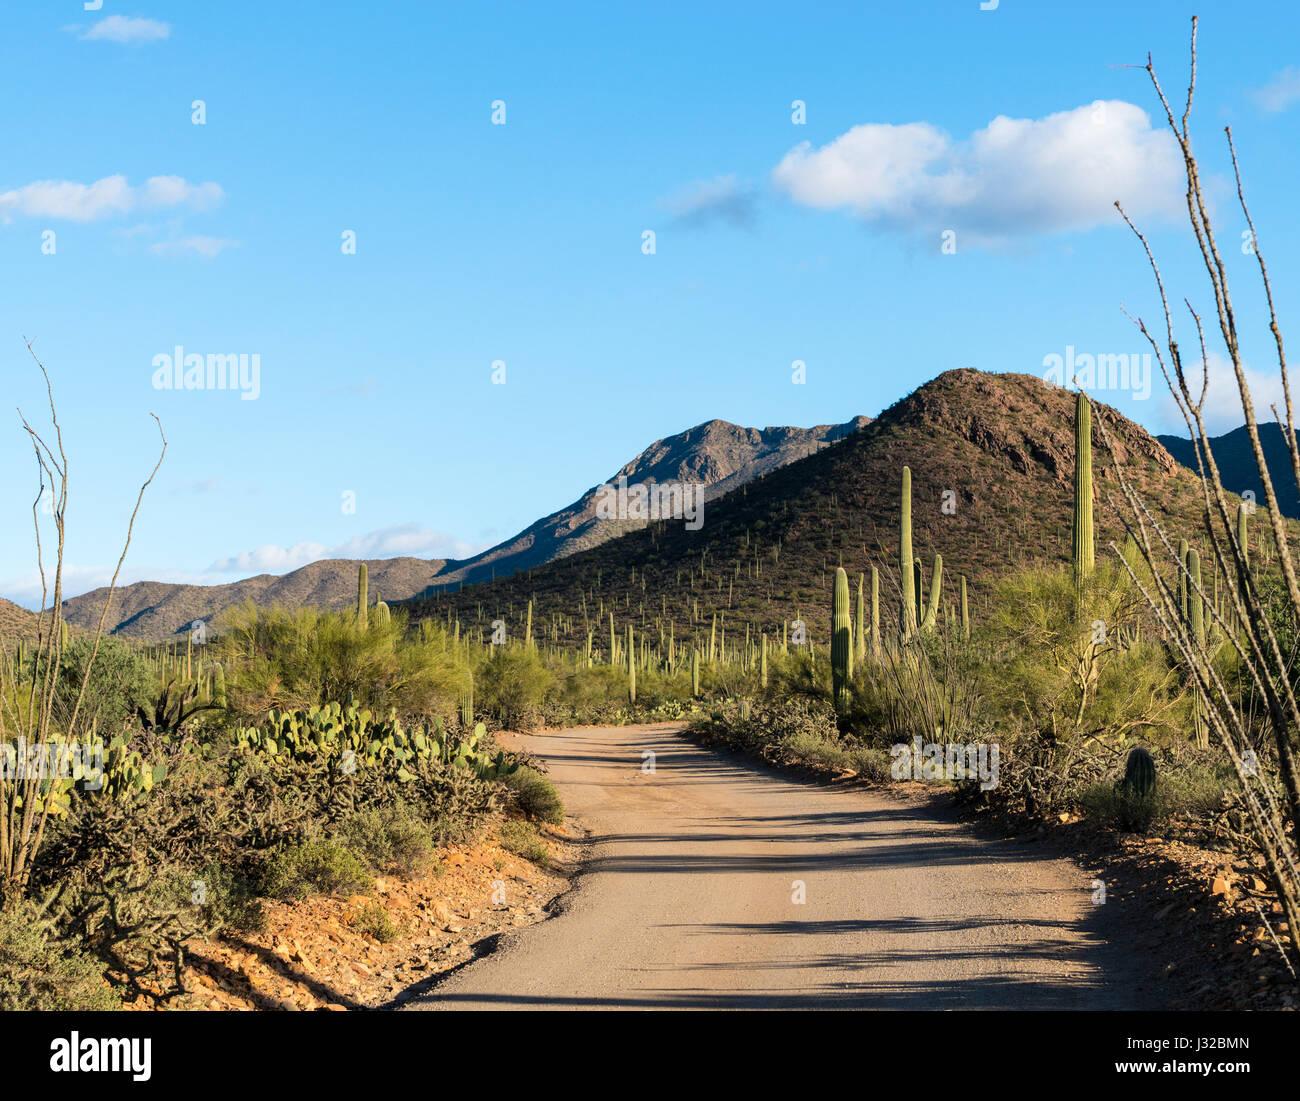 Many saguaro cactus plants line on a scenic desert road in Saguaro National Park West near Tucson, Arizona - Stock Image